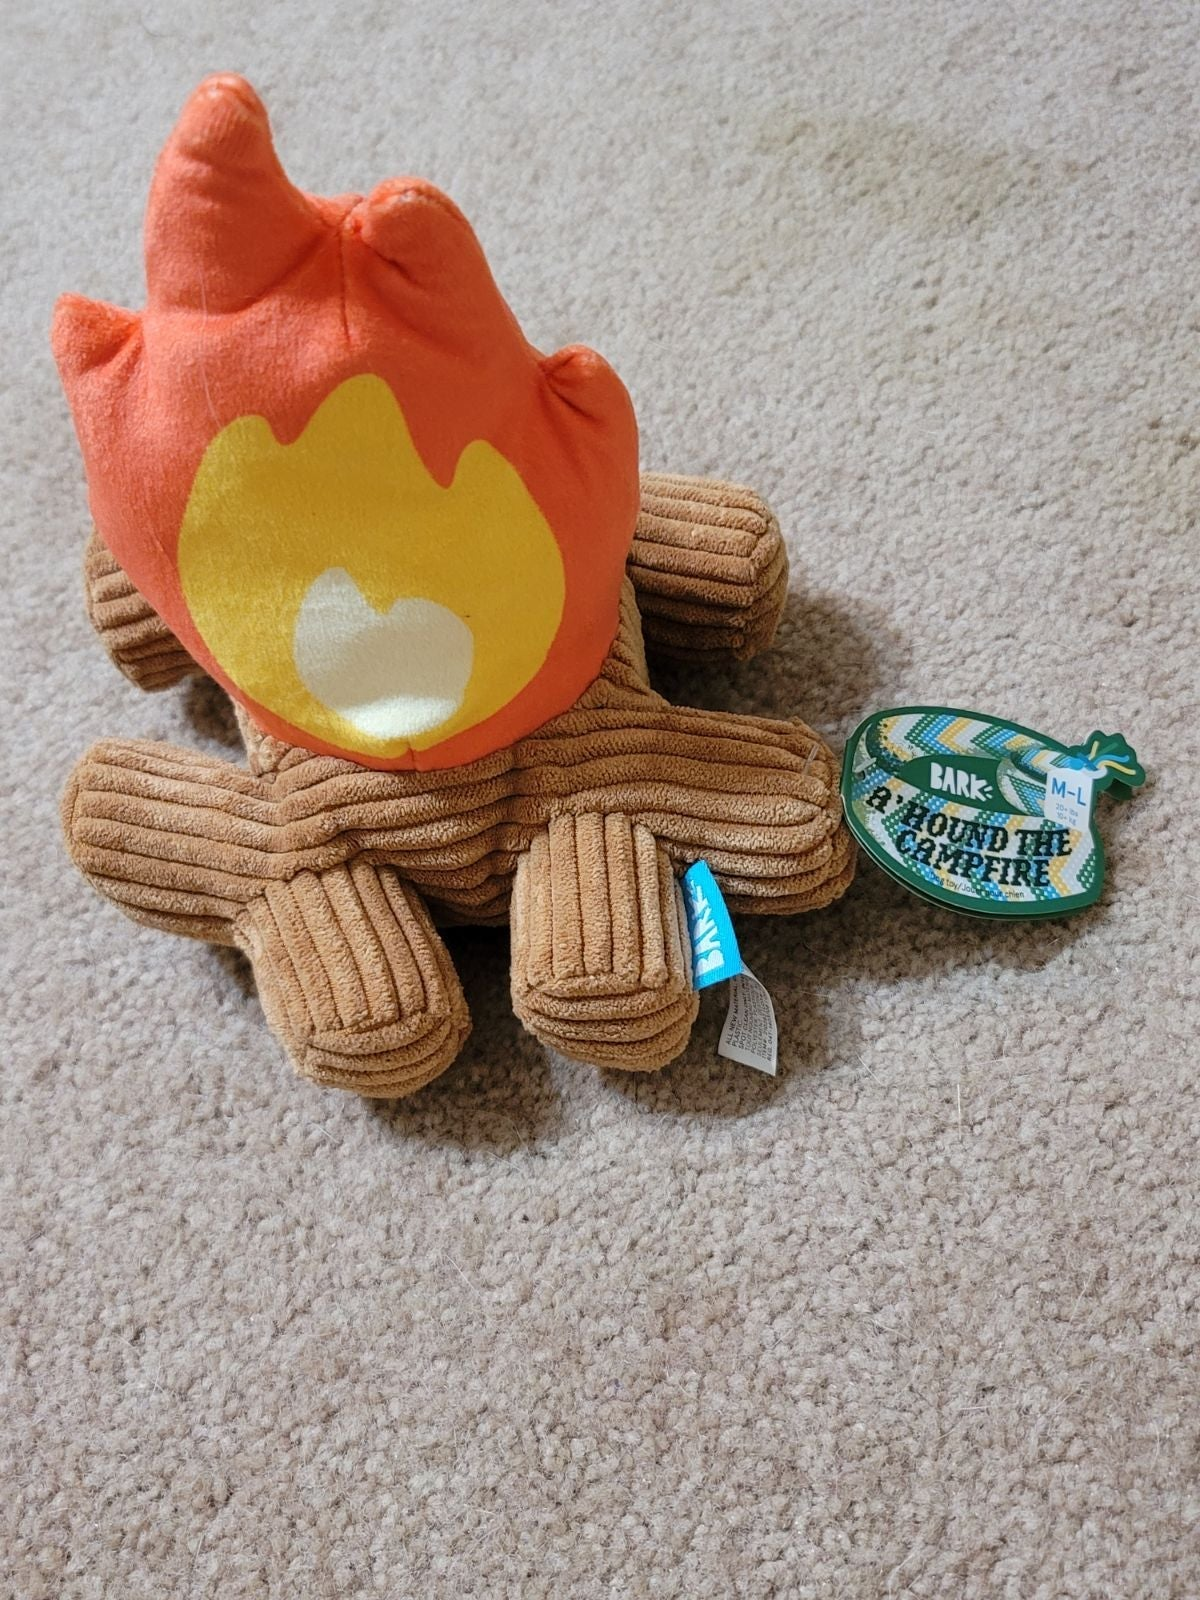 Barkbox plush  A' hound the campfire